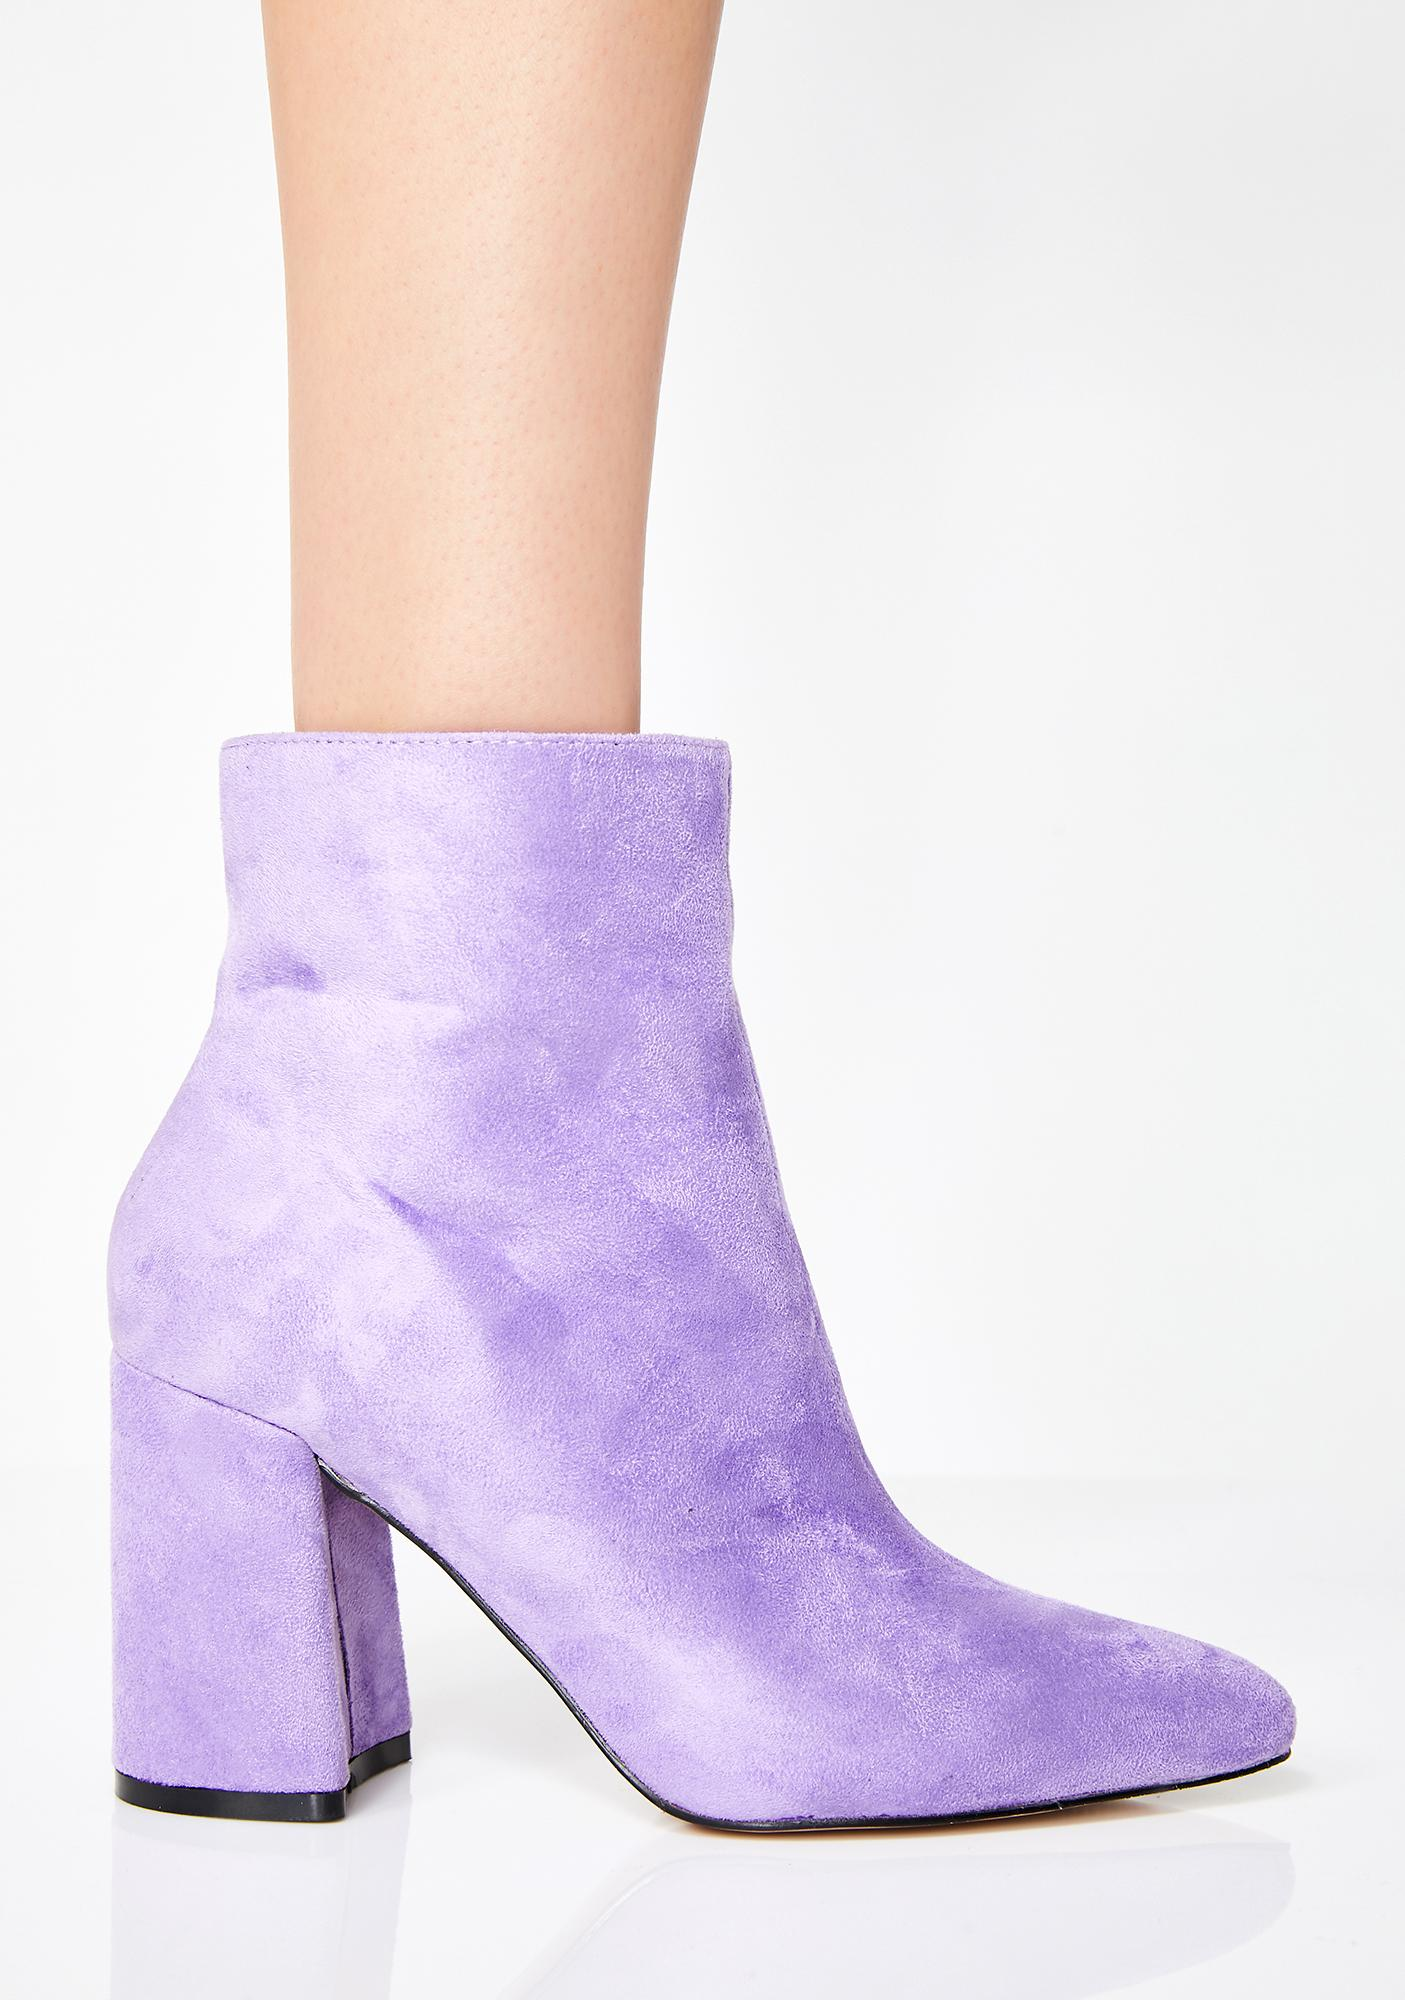 55c206c59e2 Public Desire Lilac Alpha Pointed Ankle Boots